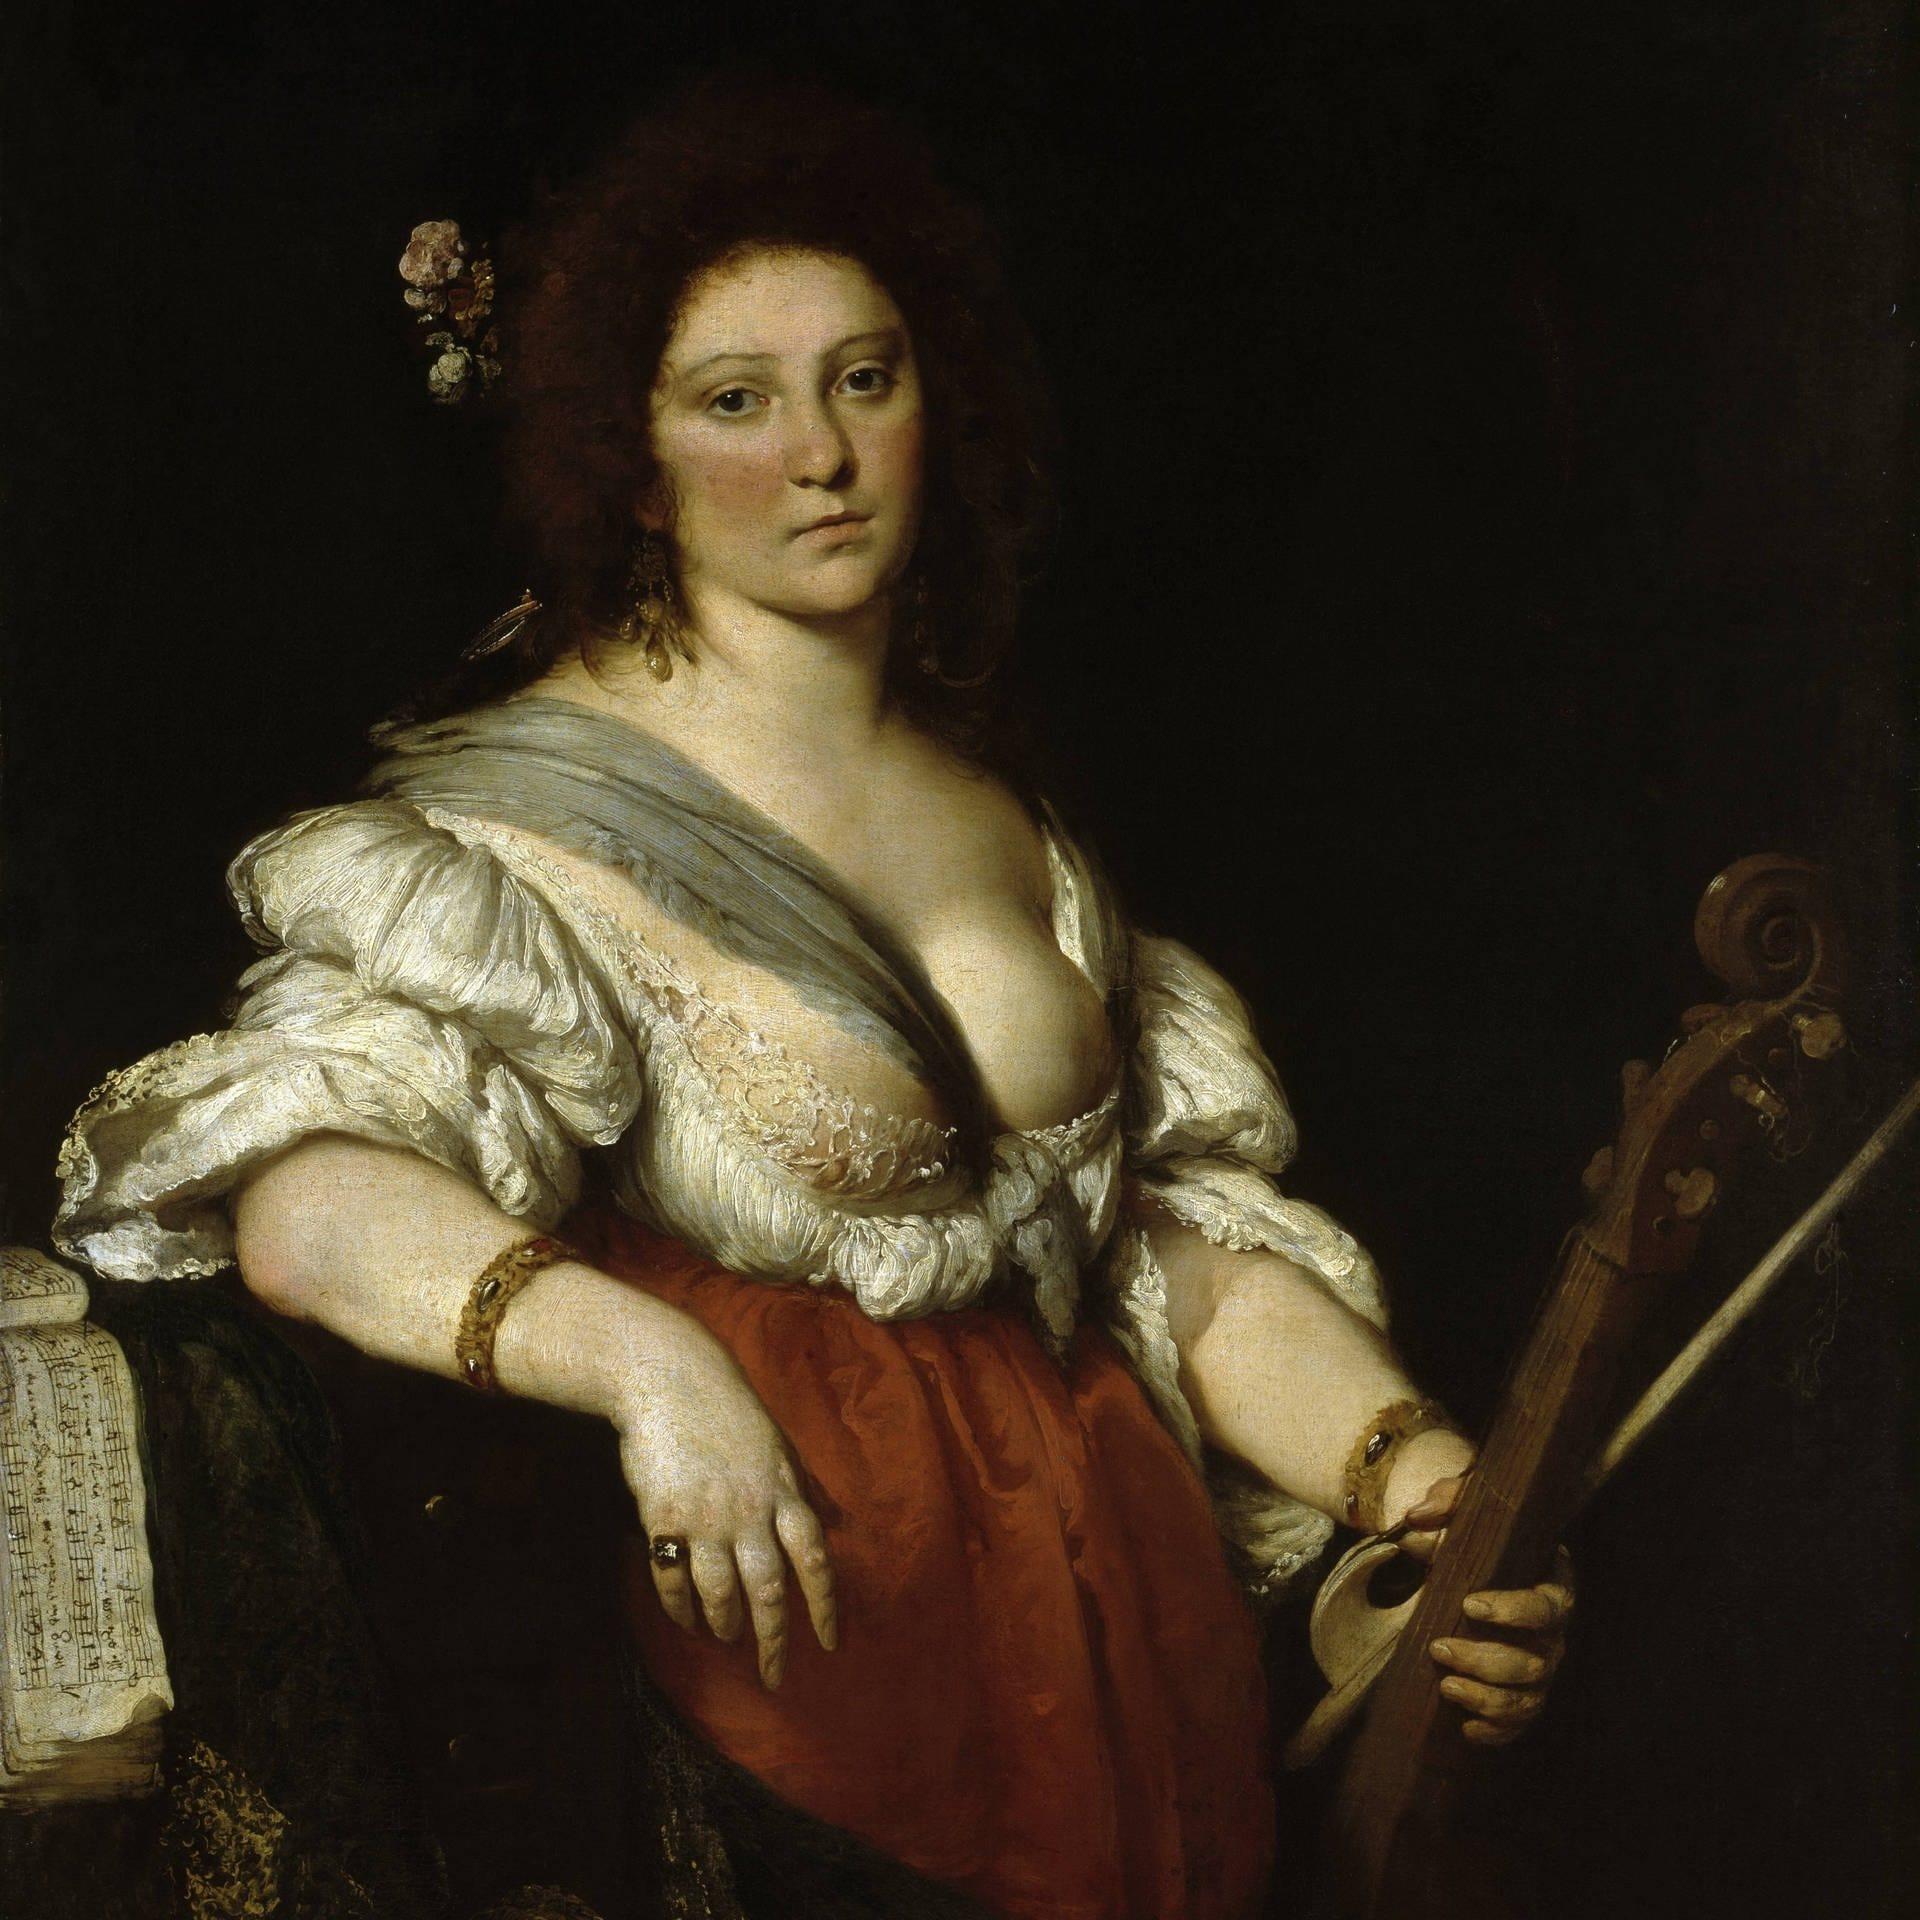 Barbara Strozzi - Komponistin und Kurtisane im barocken Venedig